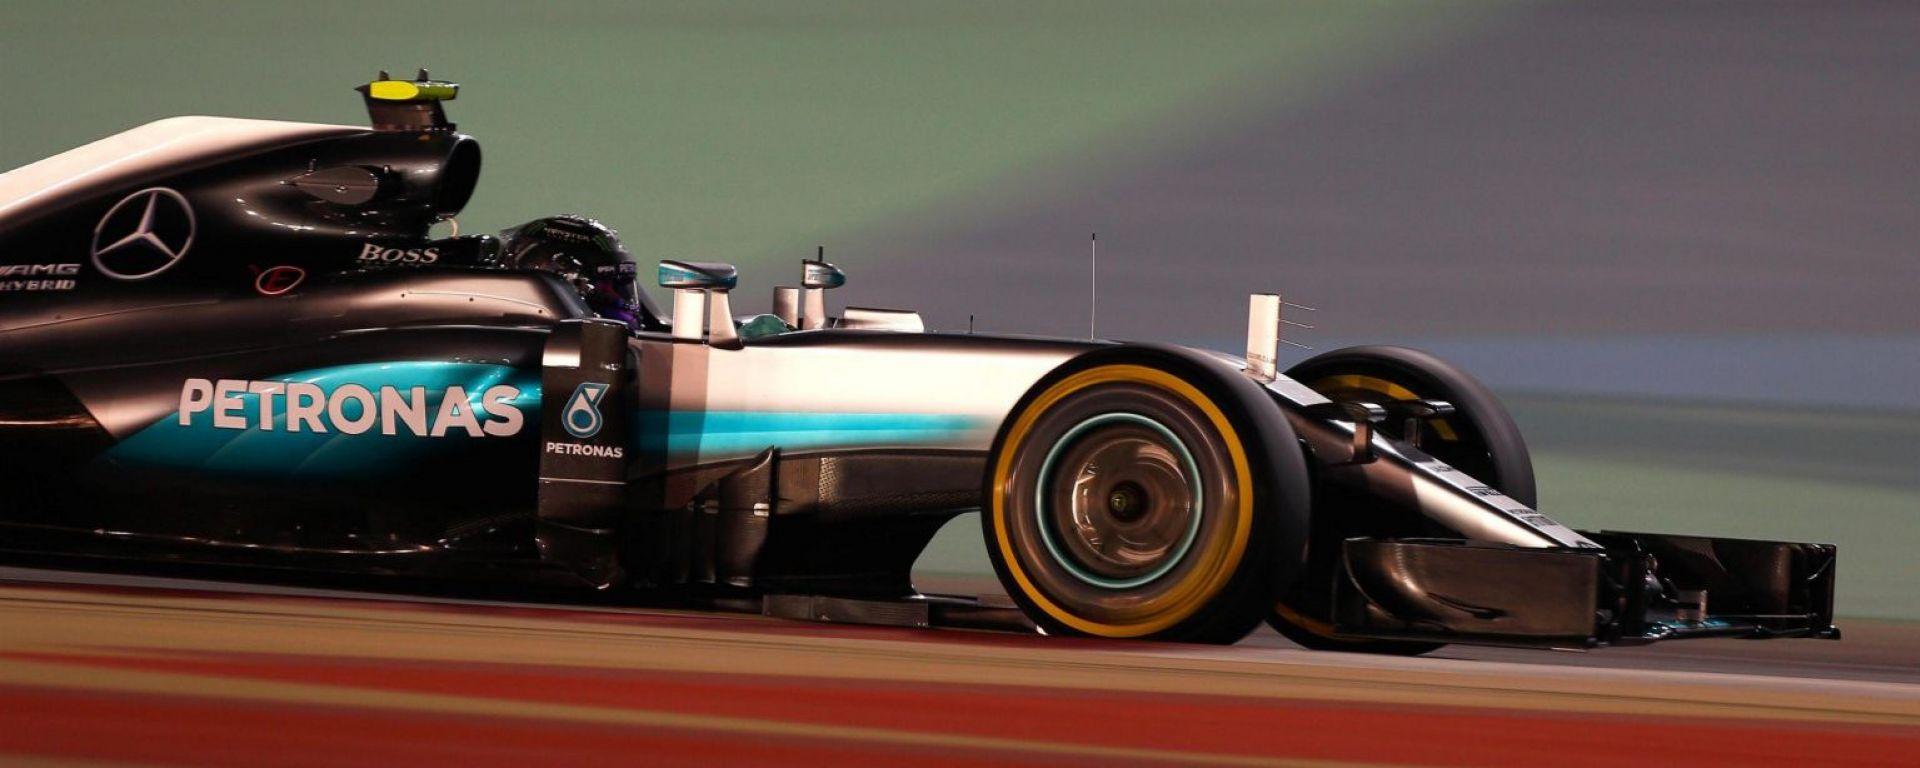 F1 GP Bahrain: Rosberg 1°, la Ferrari tradisce Vettel